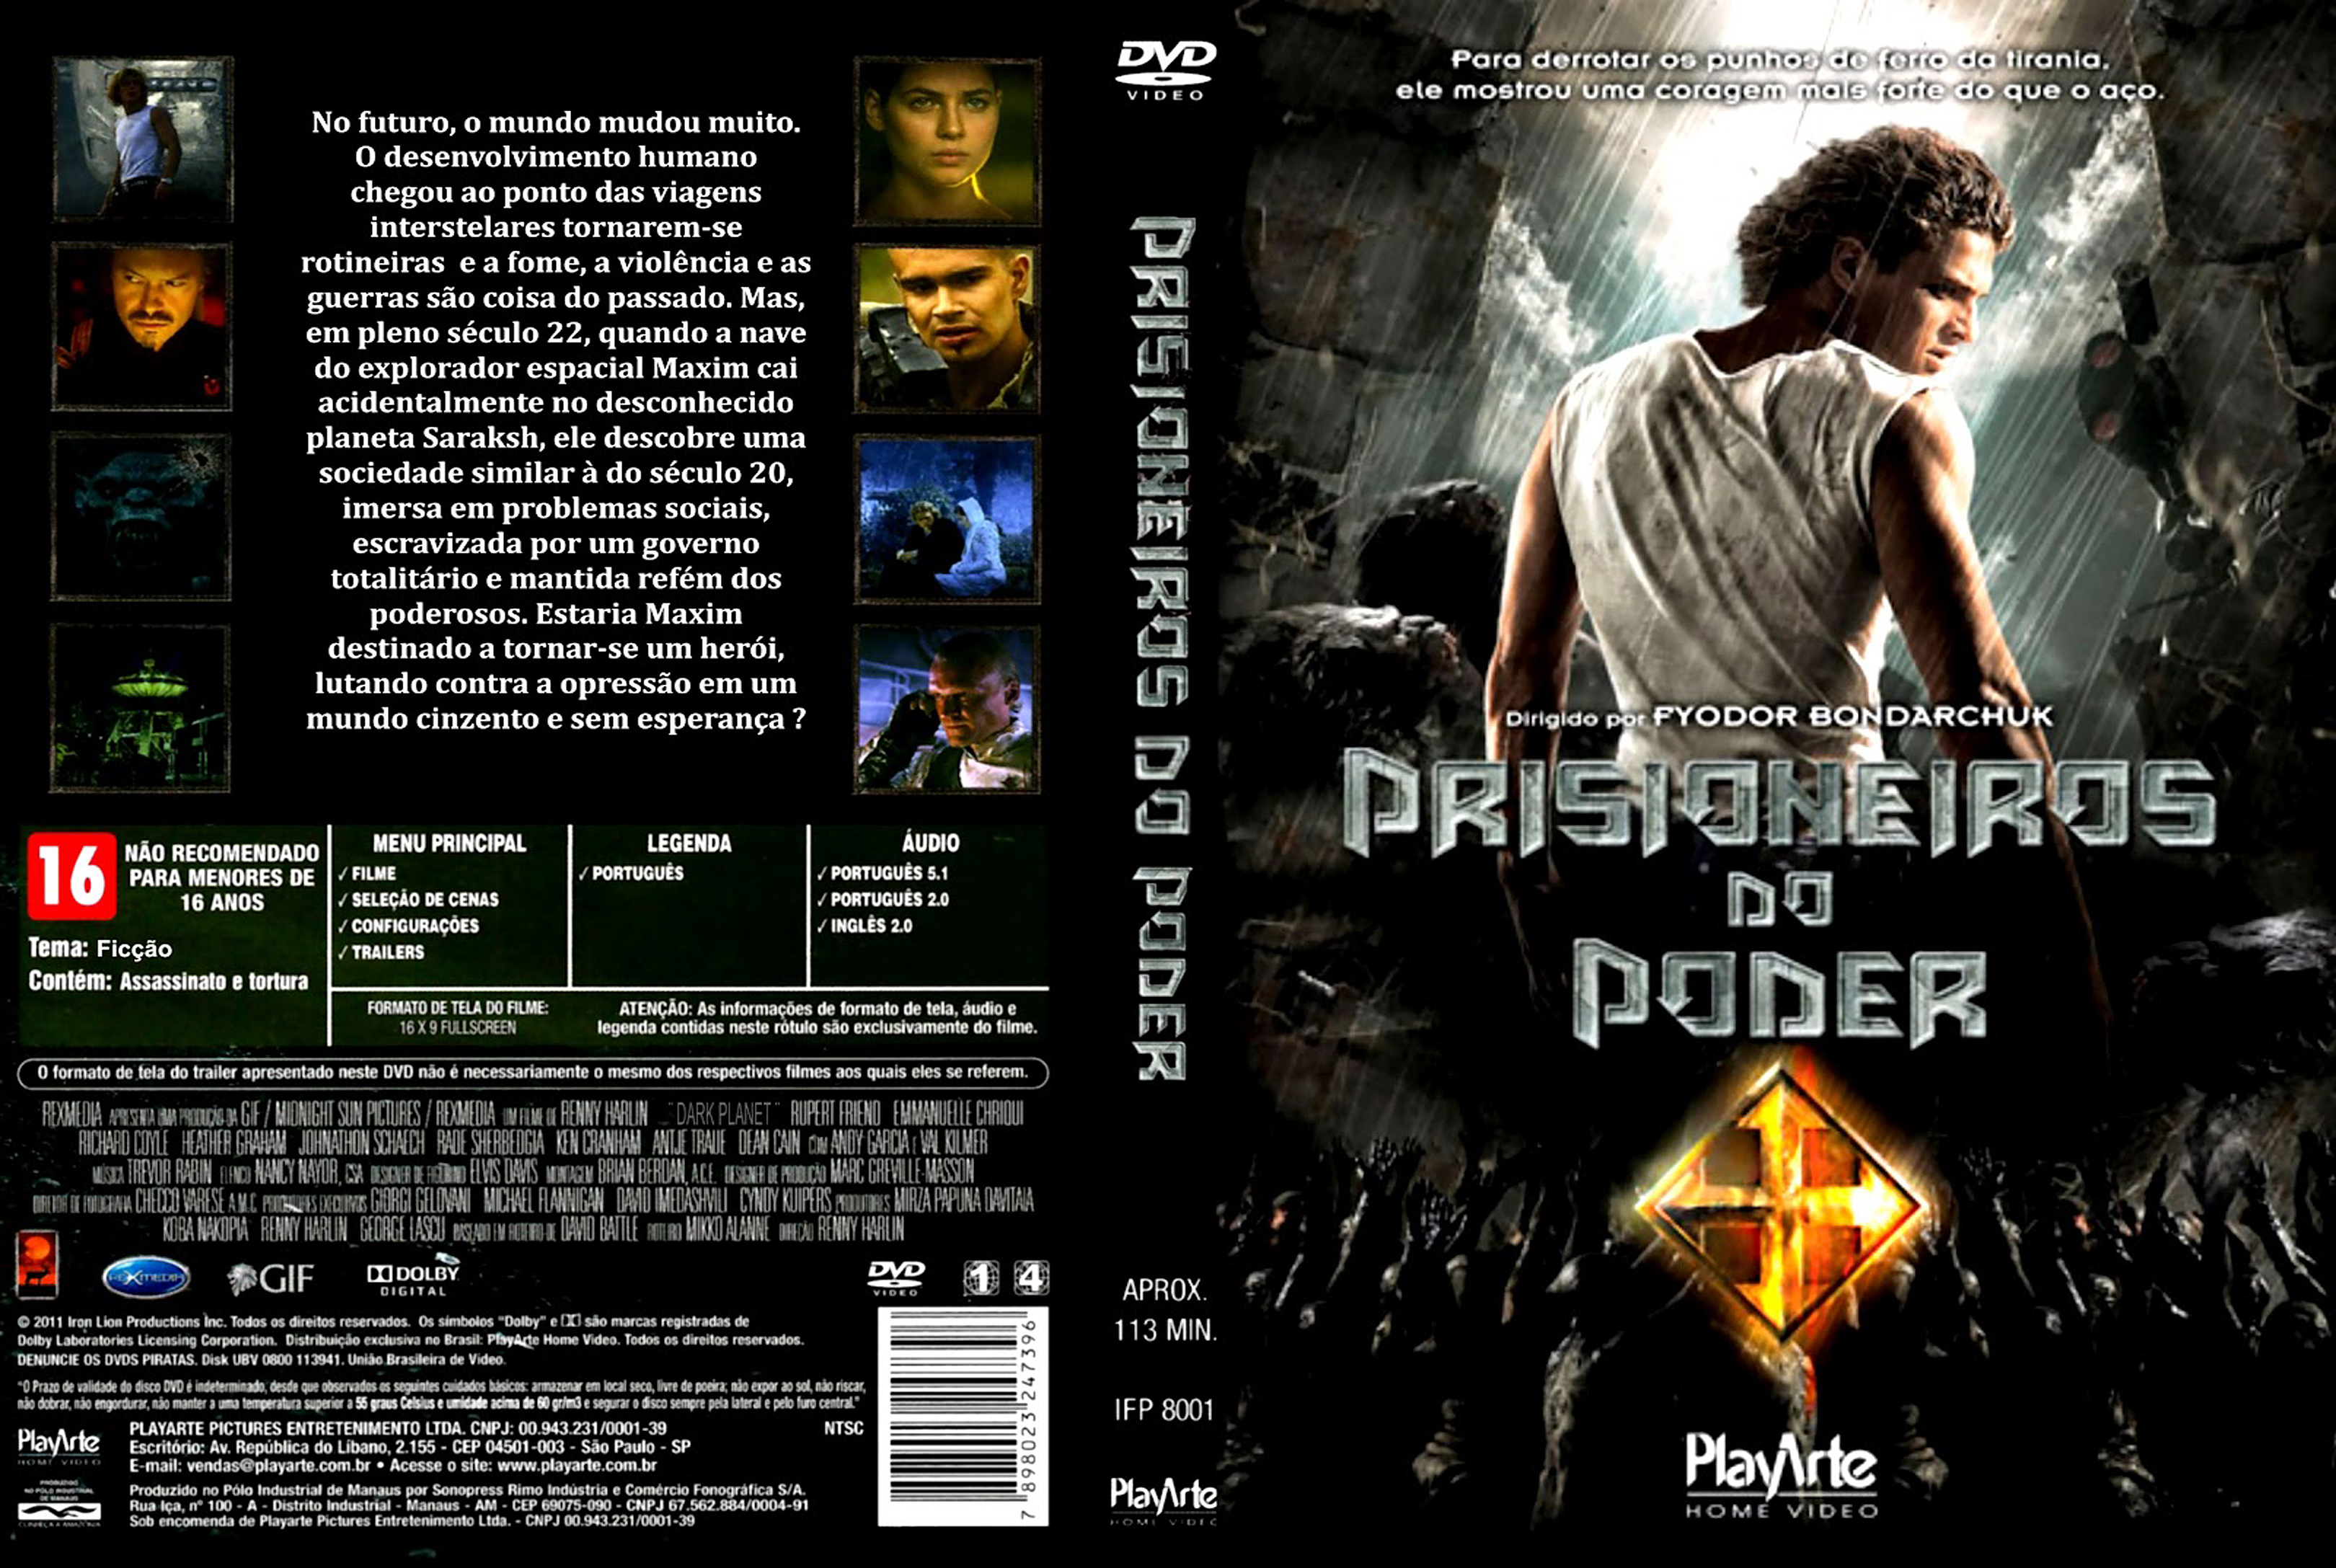 PrisioneirosdoPoder